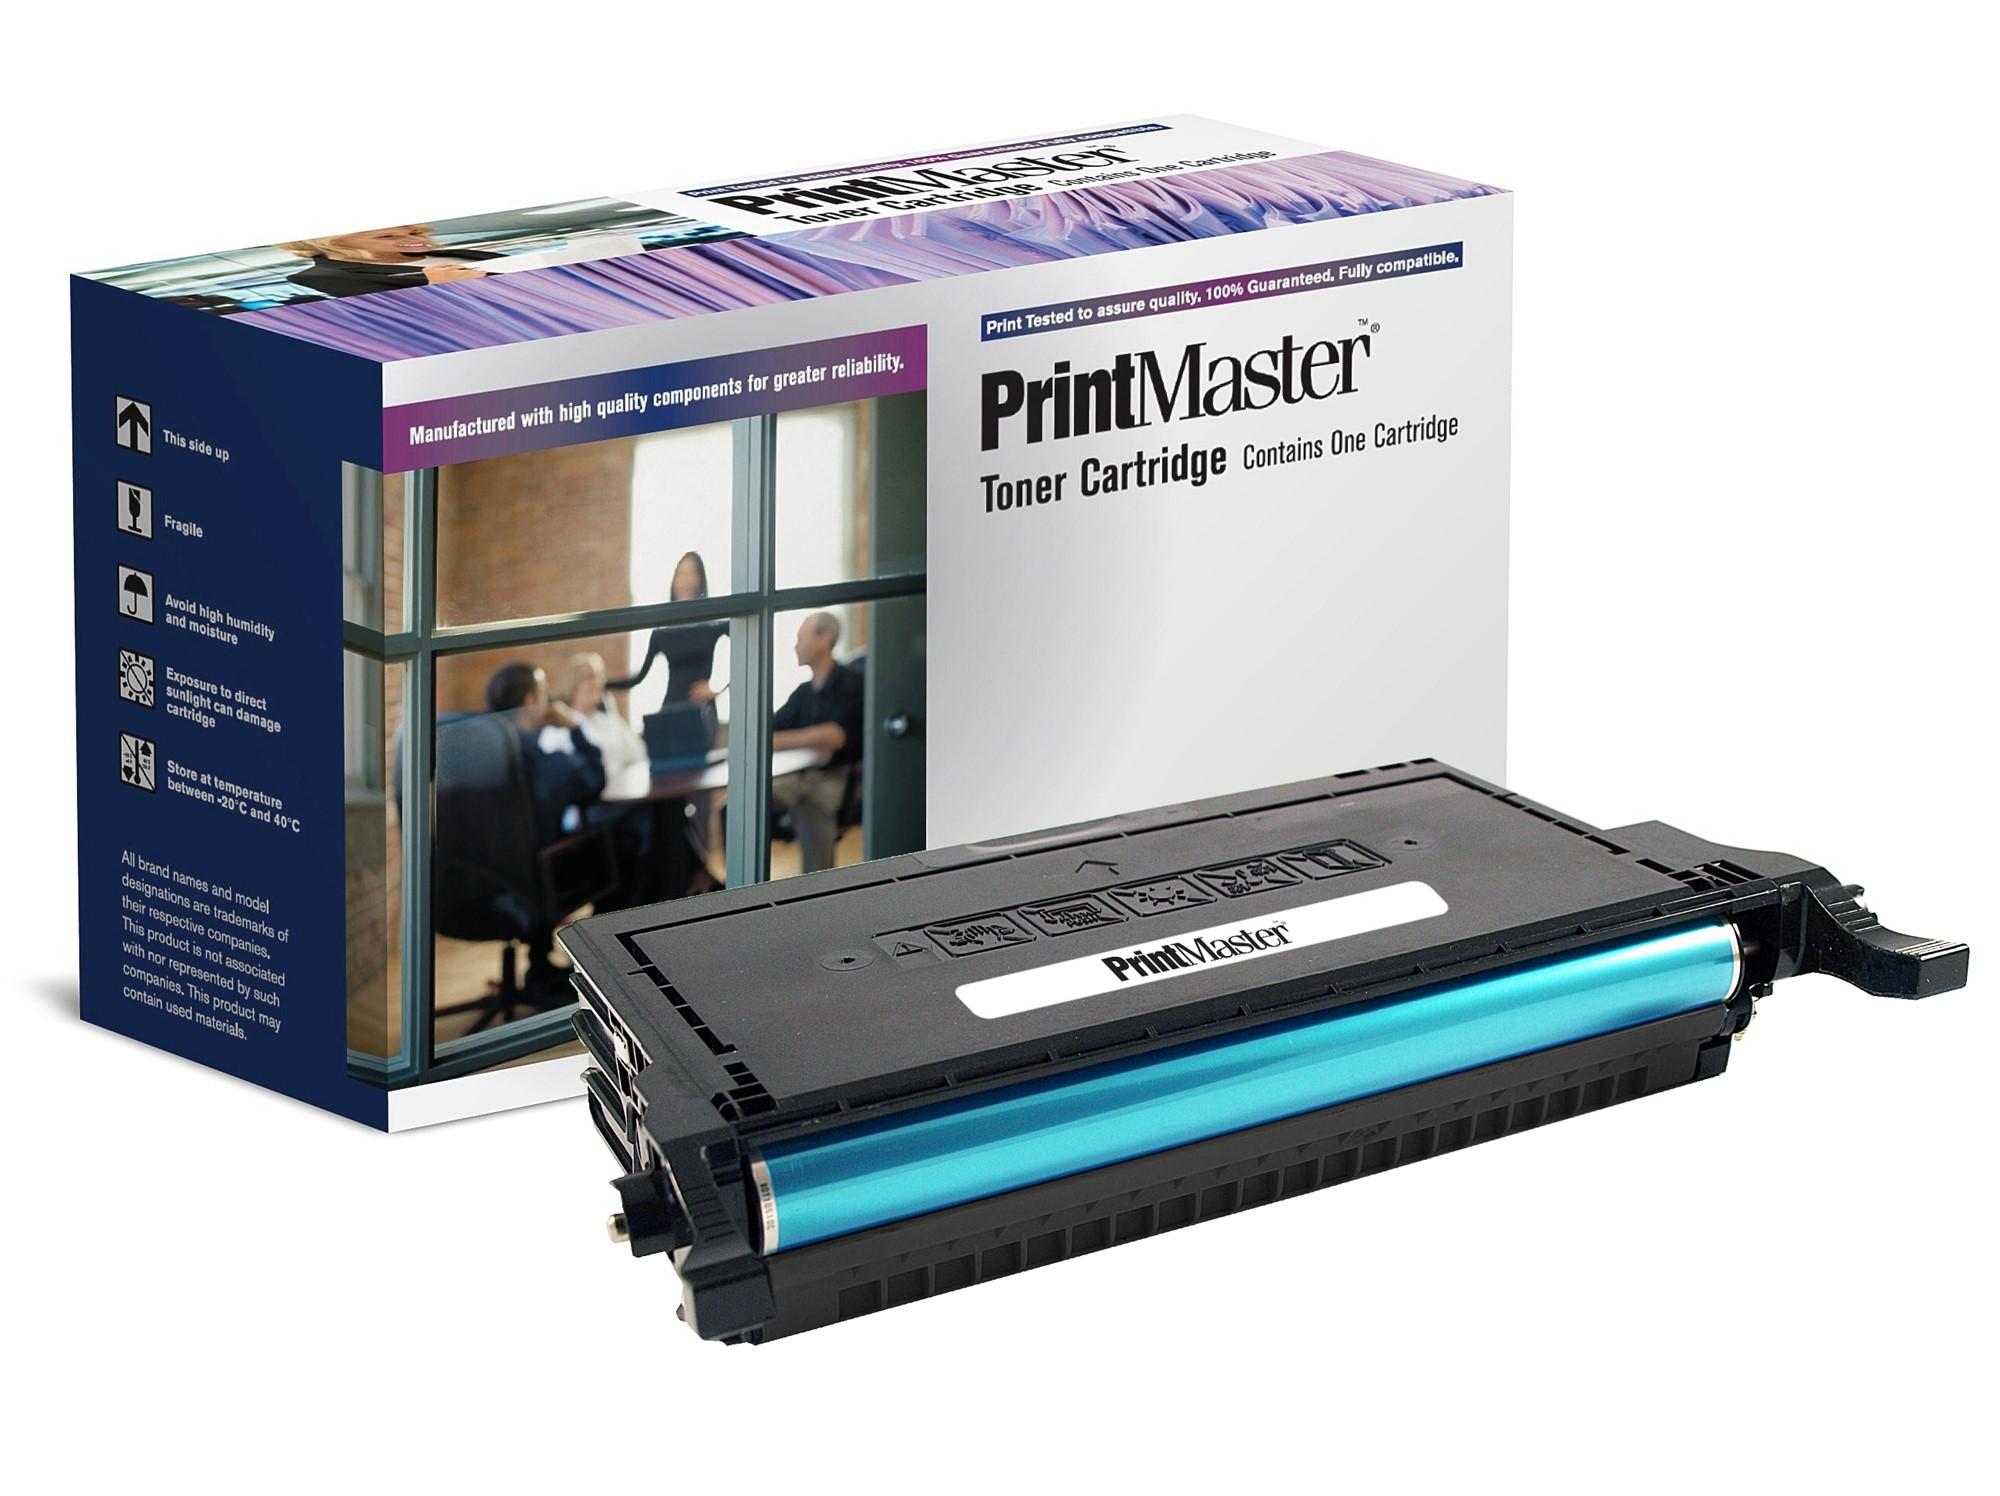 PrintMaster CLP-620/670 Black Toner 5K